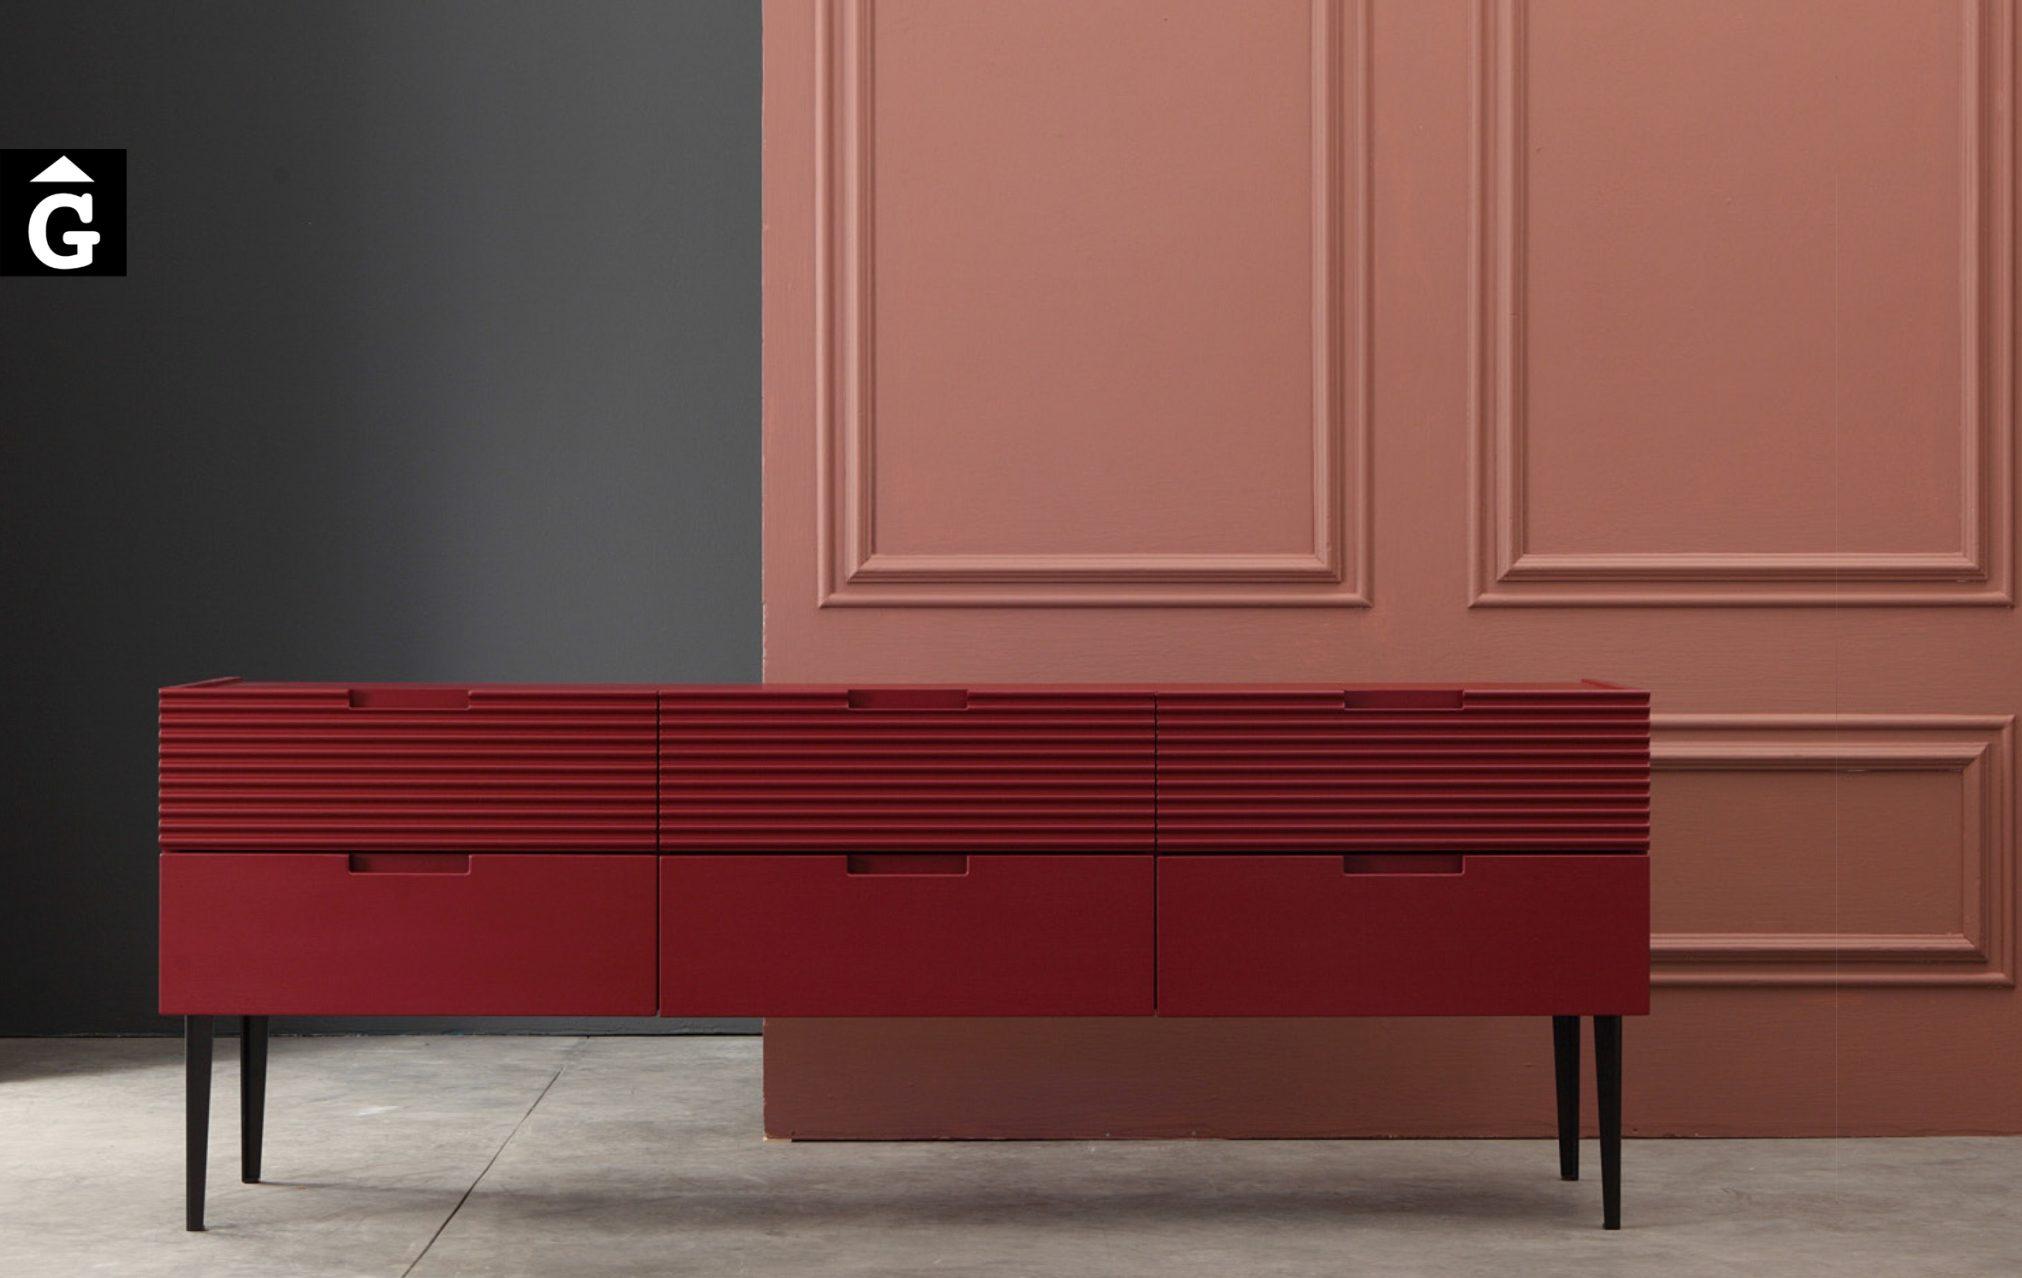 Devina Nais moble baix color by Mobles GIFREU Girona modern qualitat vanguardia minim elegant atemporal